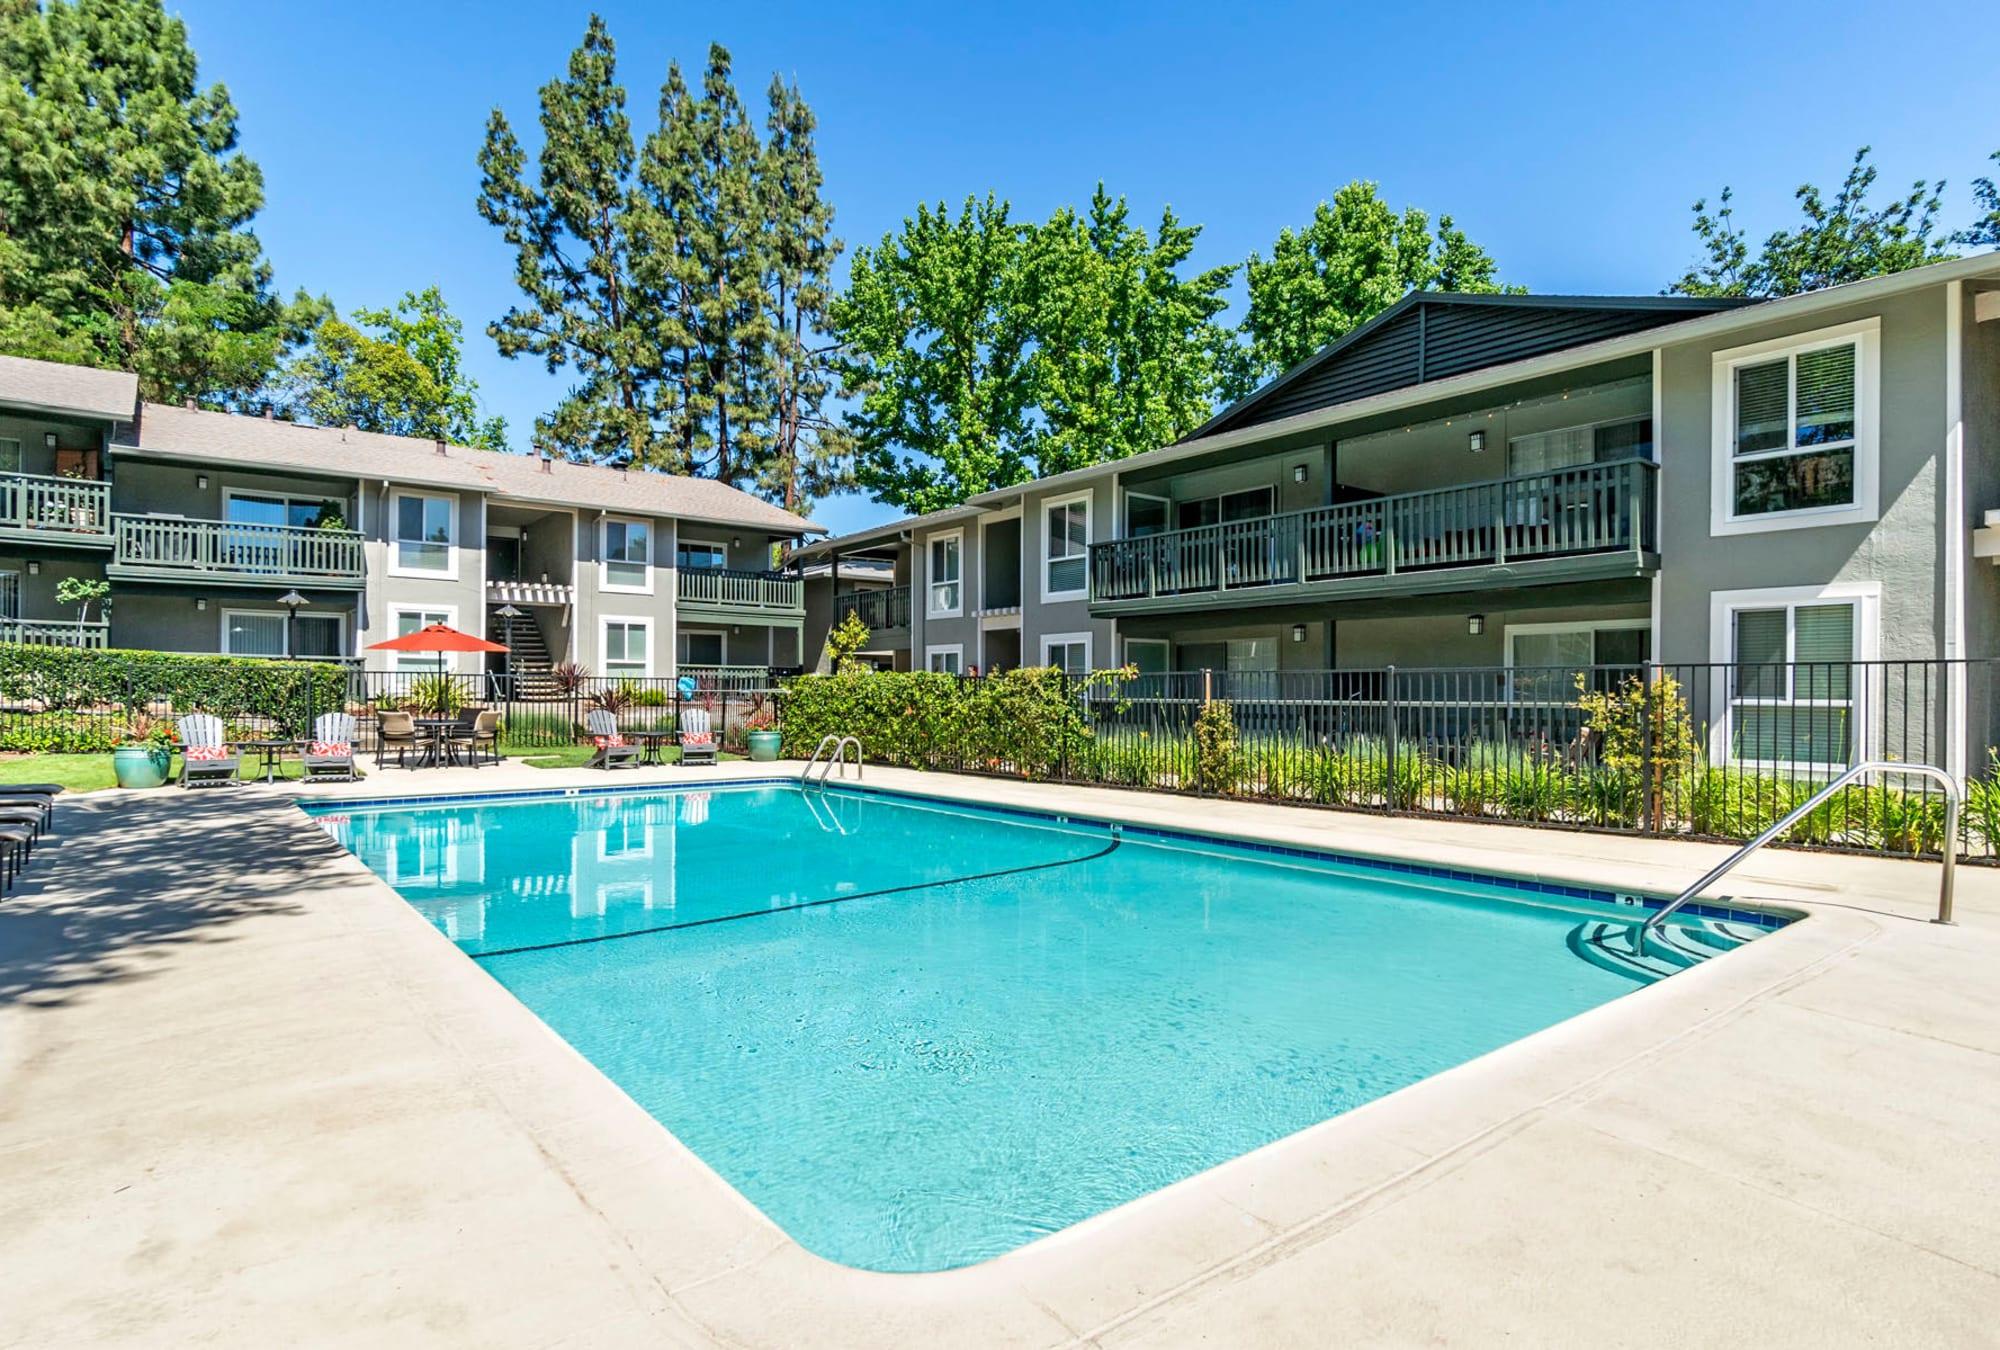 Gorgeous day at the swimming pool at Pleasanton Glen Apartment Homes in Pleasanton, California